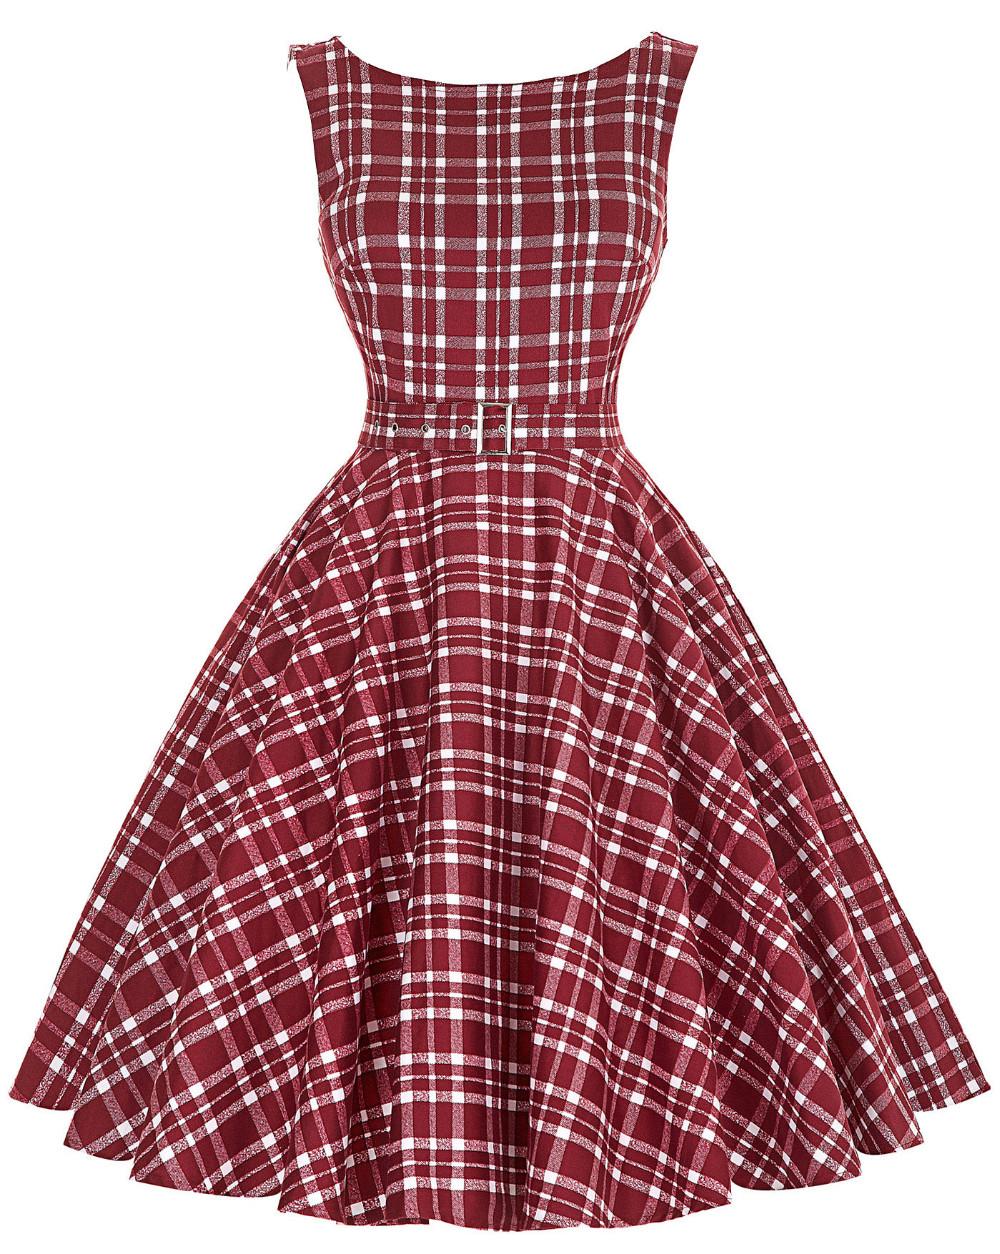 Sleeveless Cotton Plaid Striped Swing Dress 1